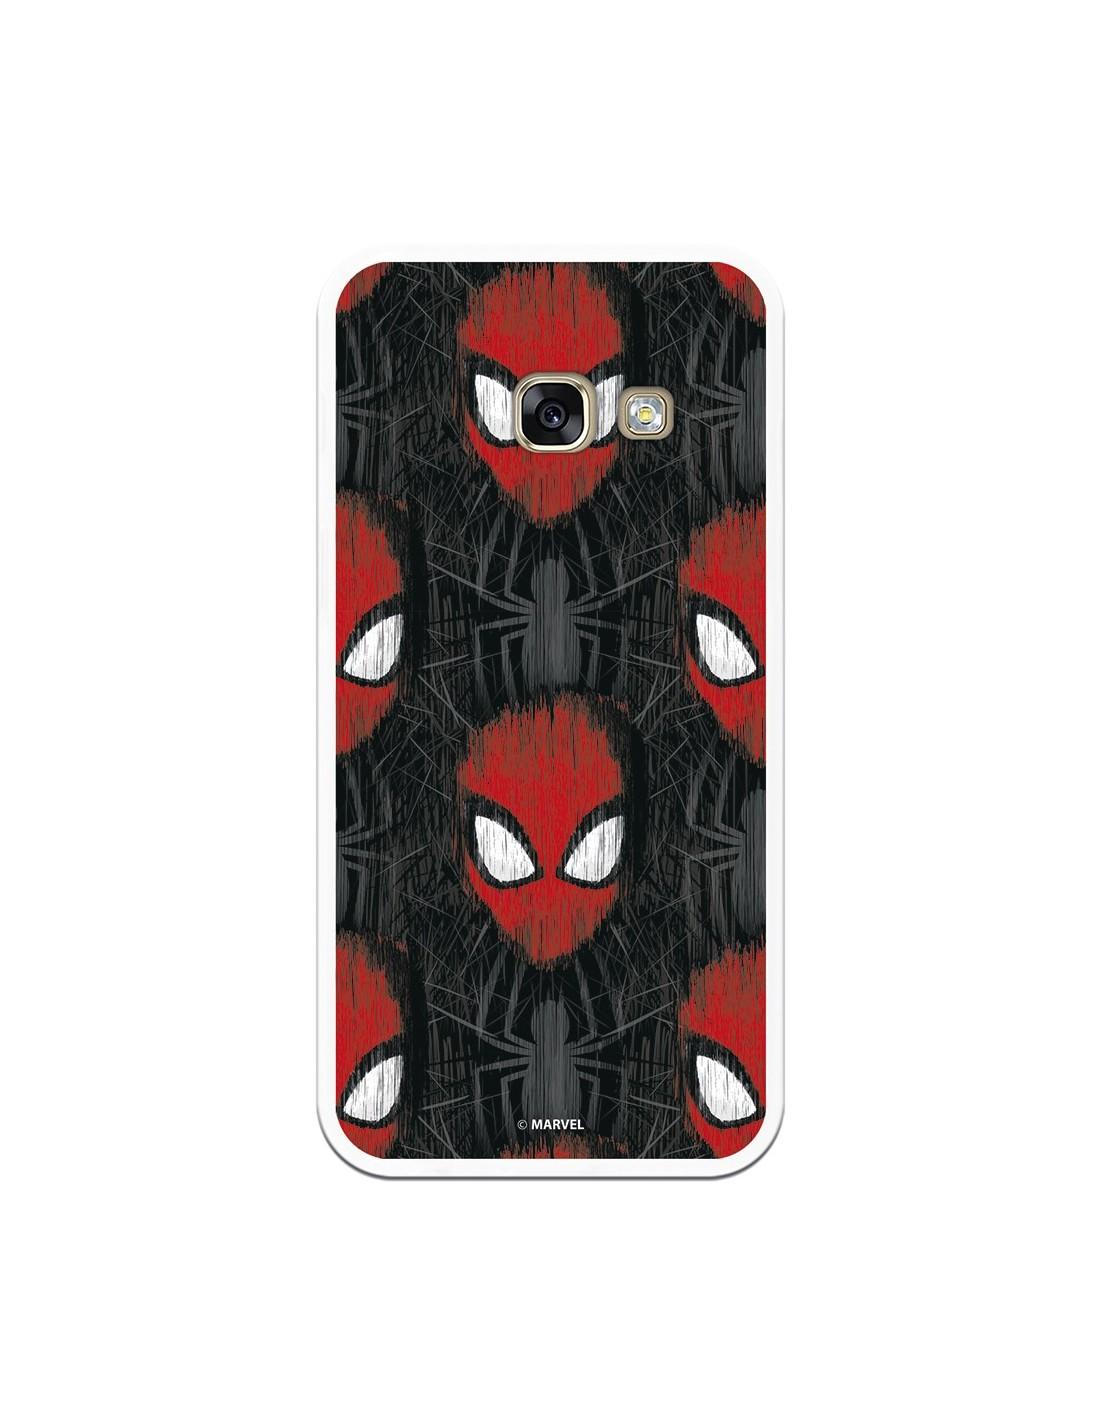 Marvel Spiderman faces Официальный чехол для Samsung Galaxy A3 2017 черный фон-Marvel